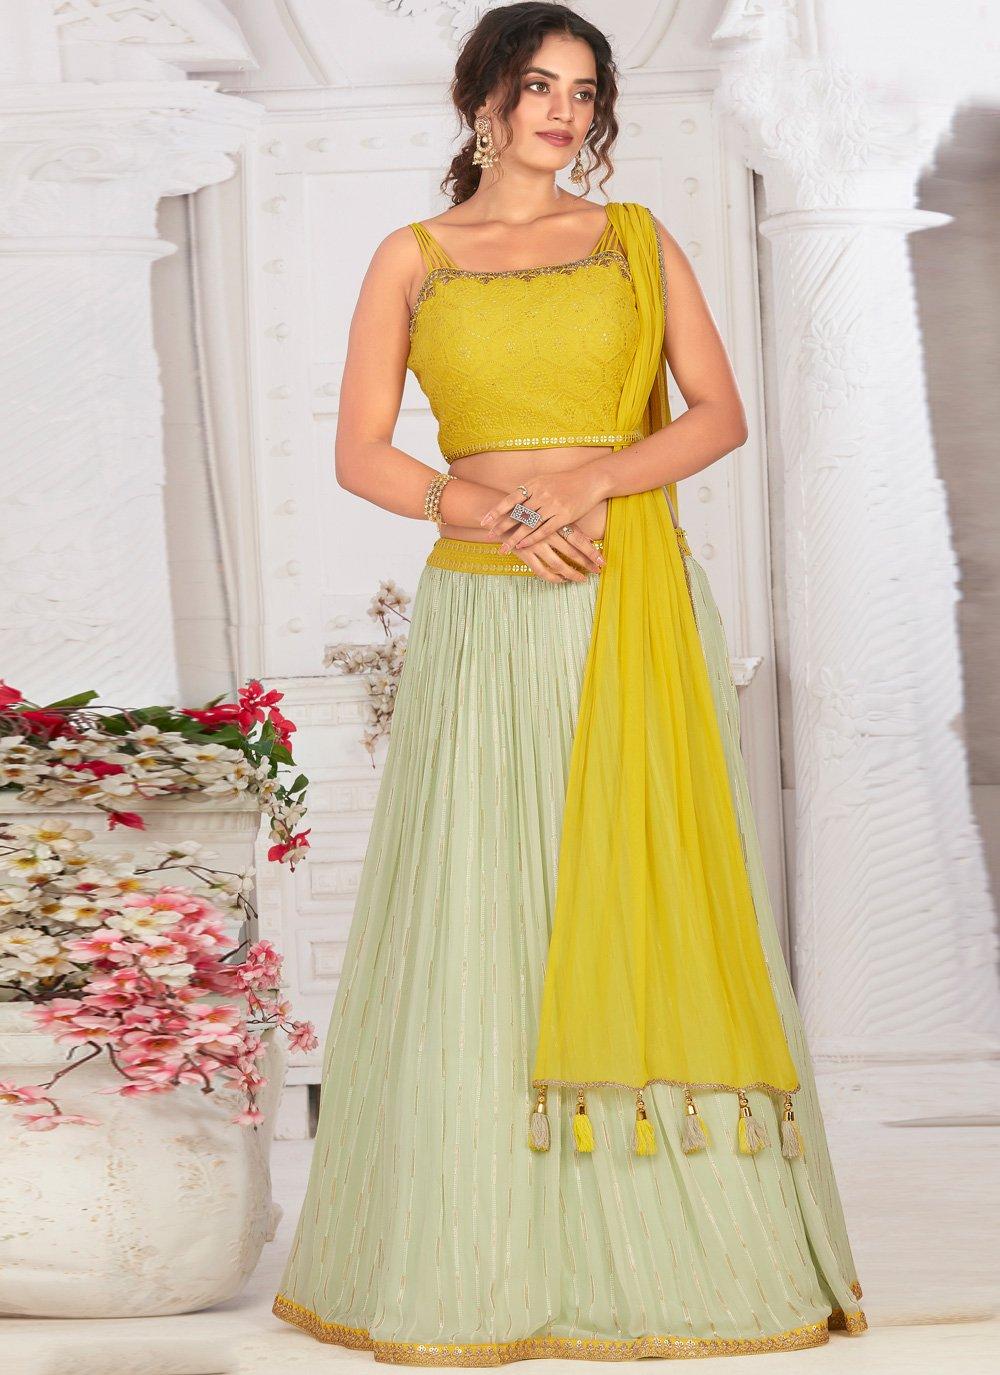 Georgette Green and Yellow Fancy Readymade Lehenga Choli